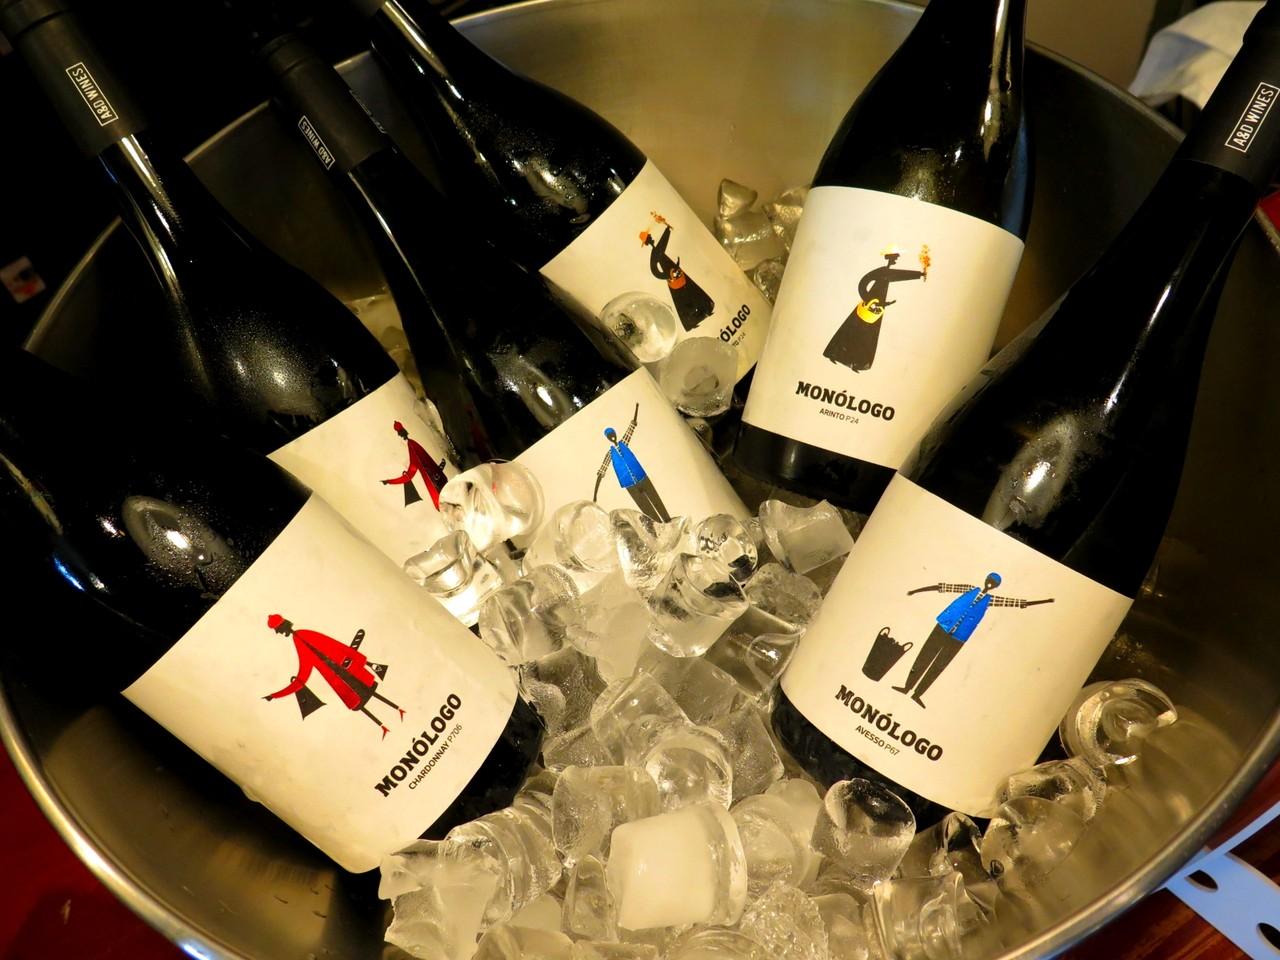 Monólogo Avesso P67 branco 2015 / Monólogo Arinto P24 branco 2015 / Monólogo Chardonnay P706 branco 2015